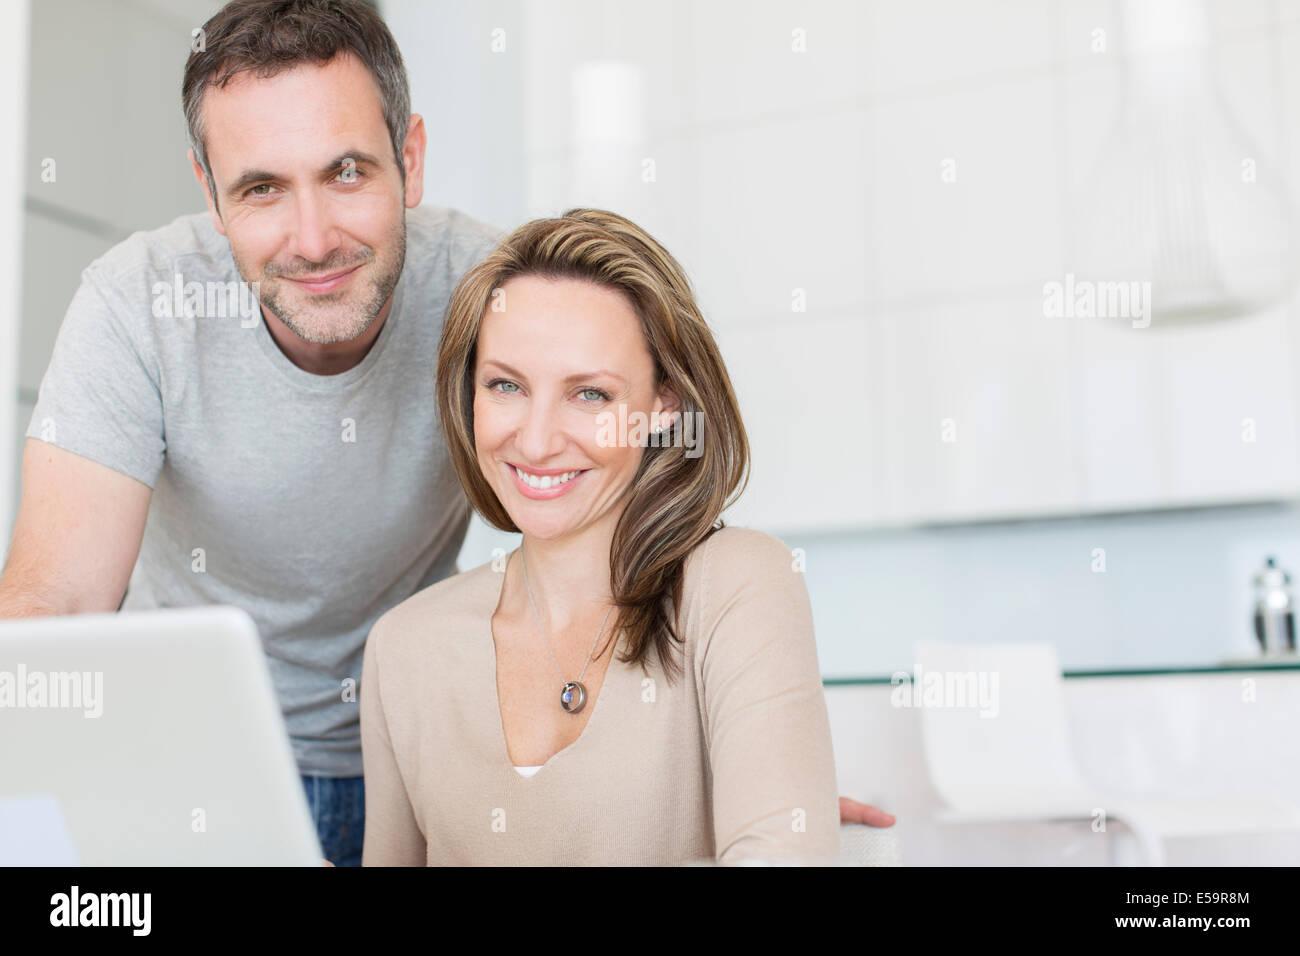 Pareja sonriente en portátil Imagen De Stock